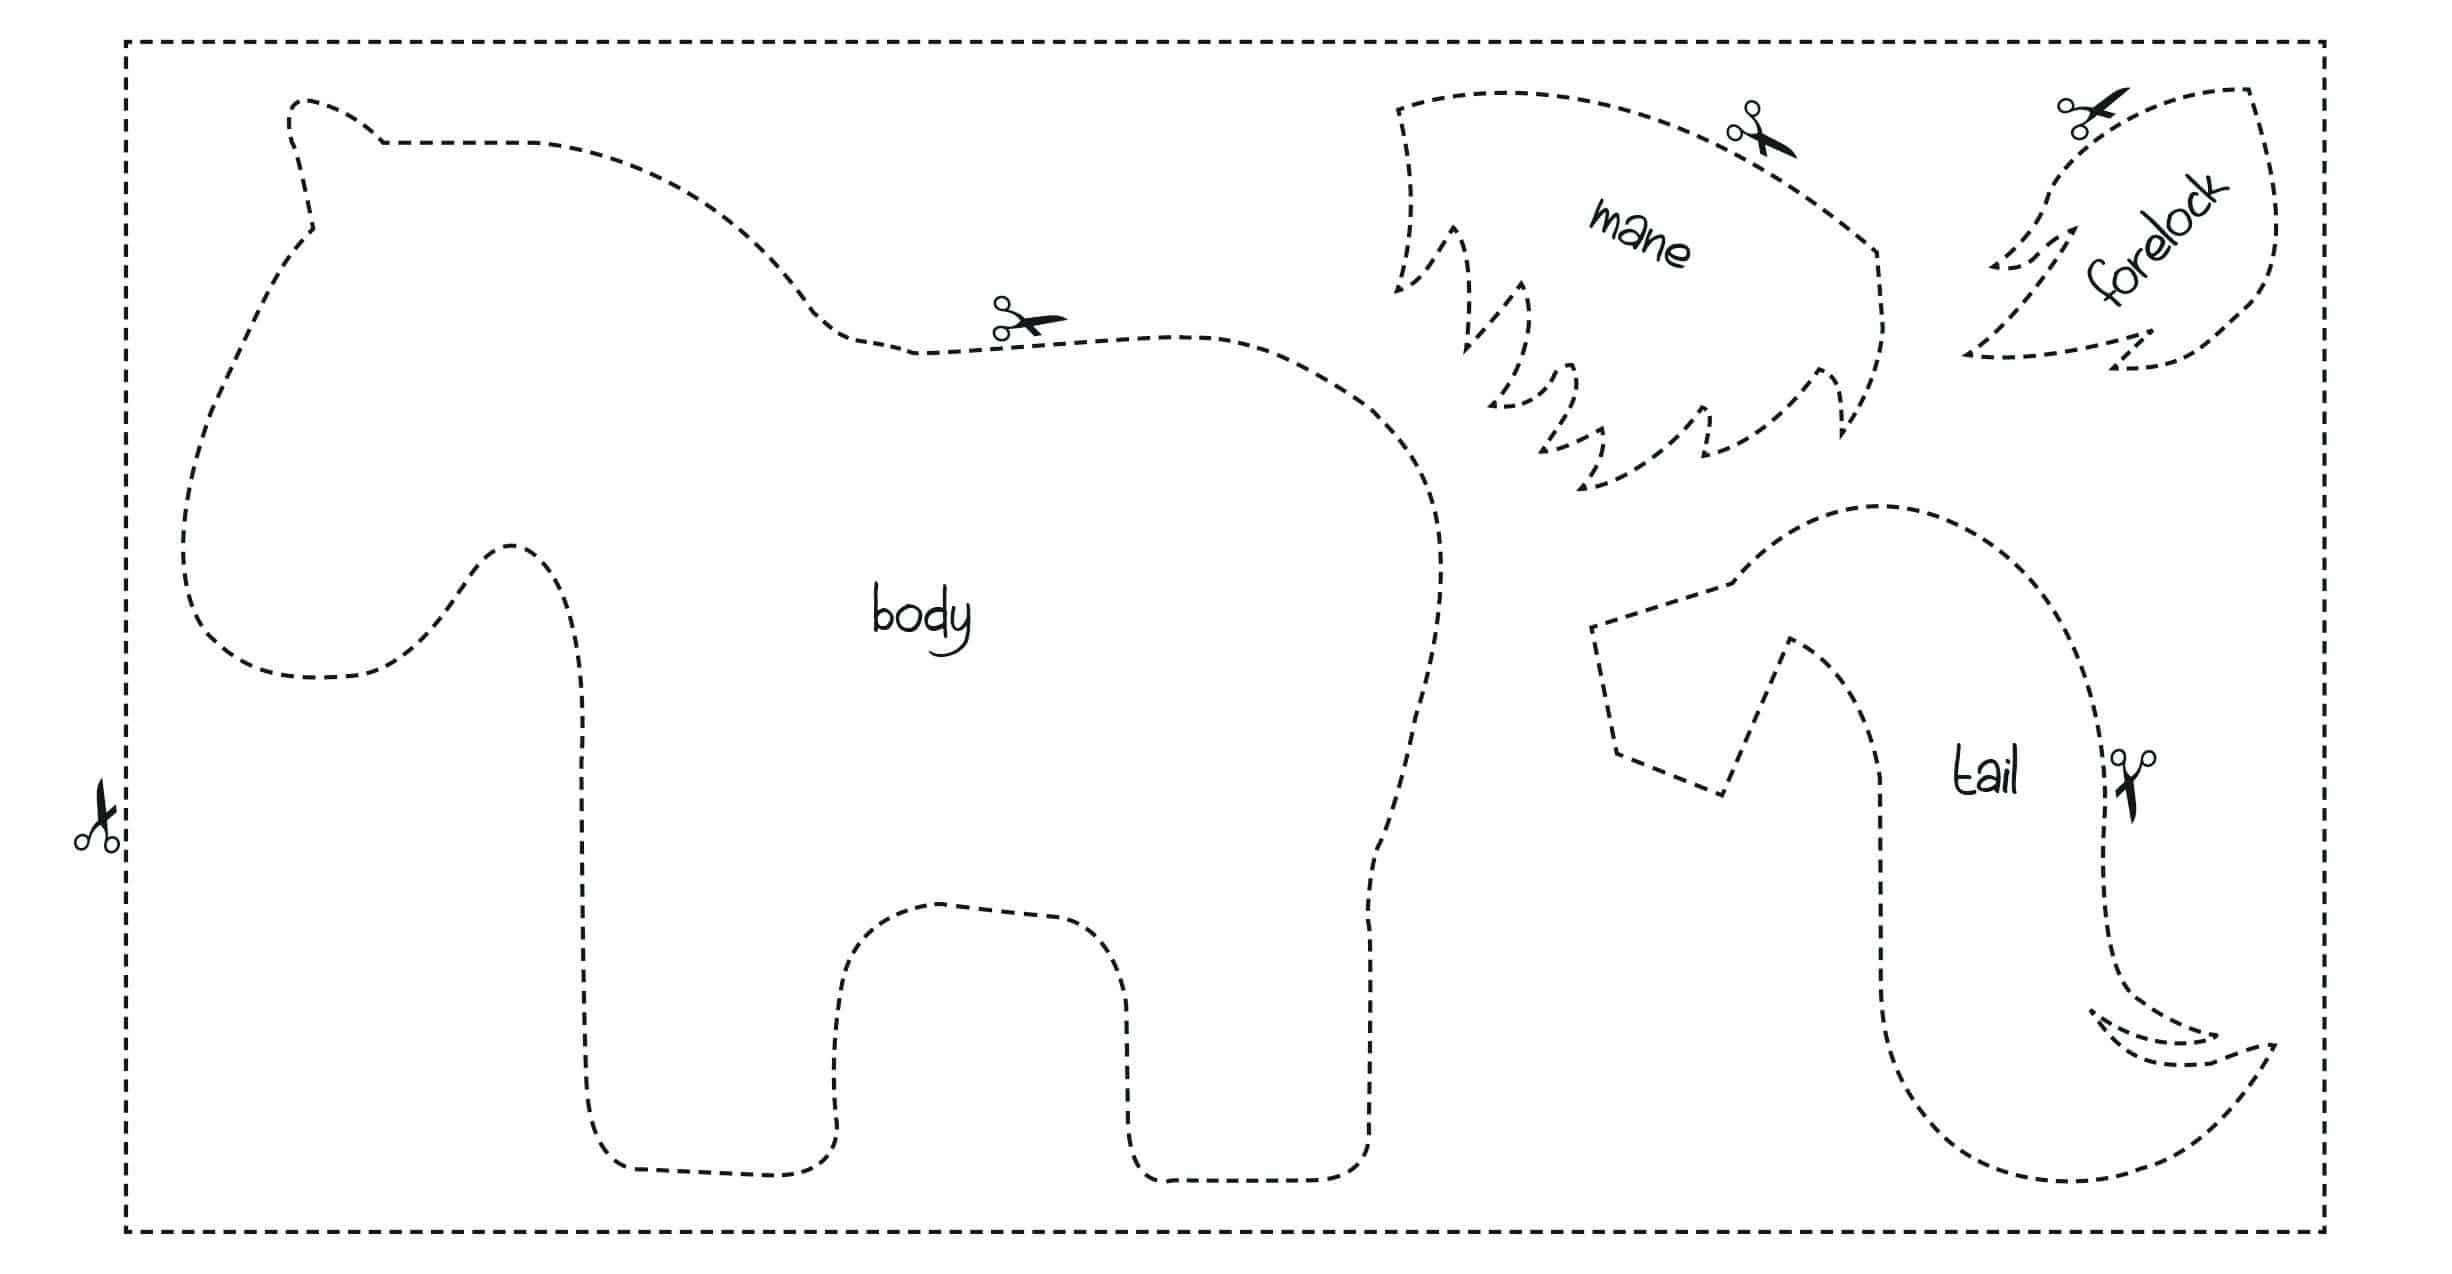 pony christmas make template pony magazine pony magazine. Black Bedroom Furniture Sets. Home Design Ideas